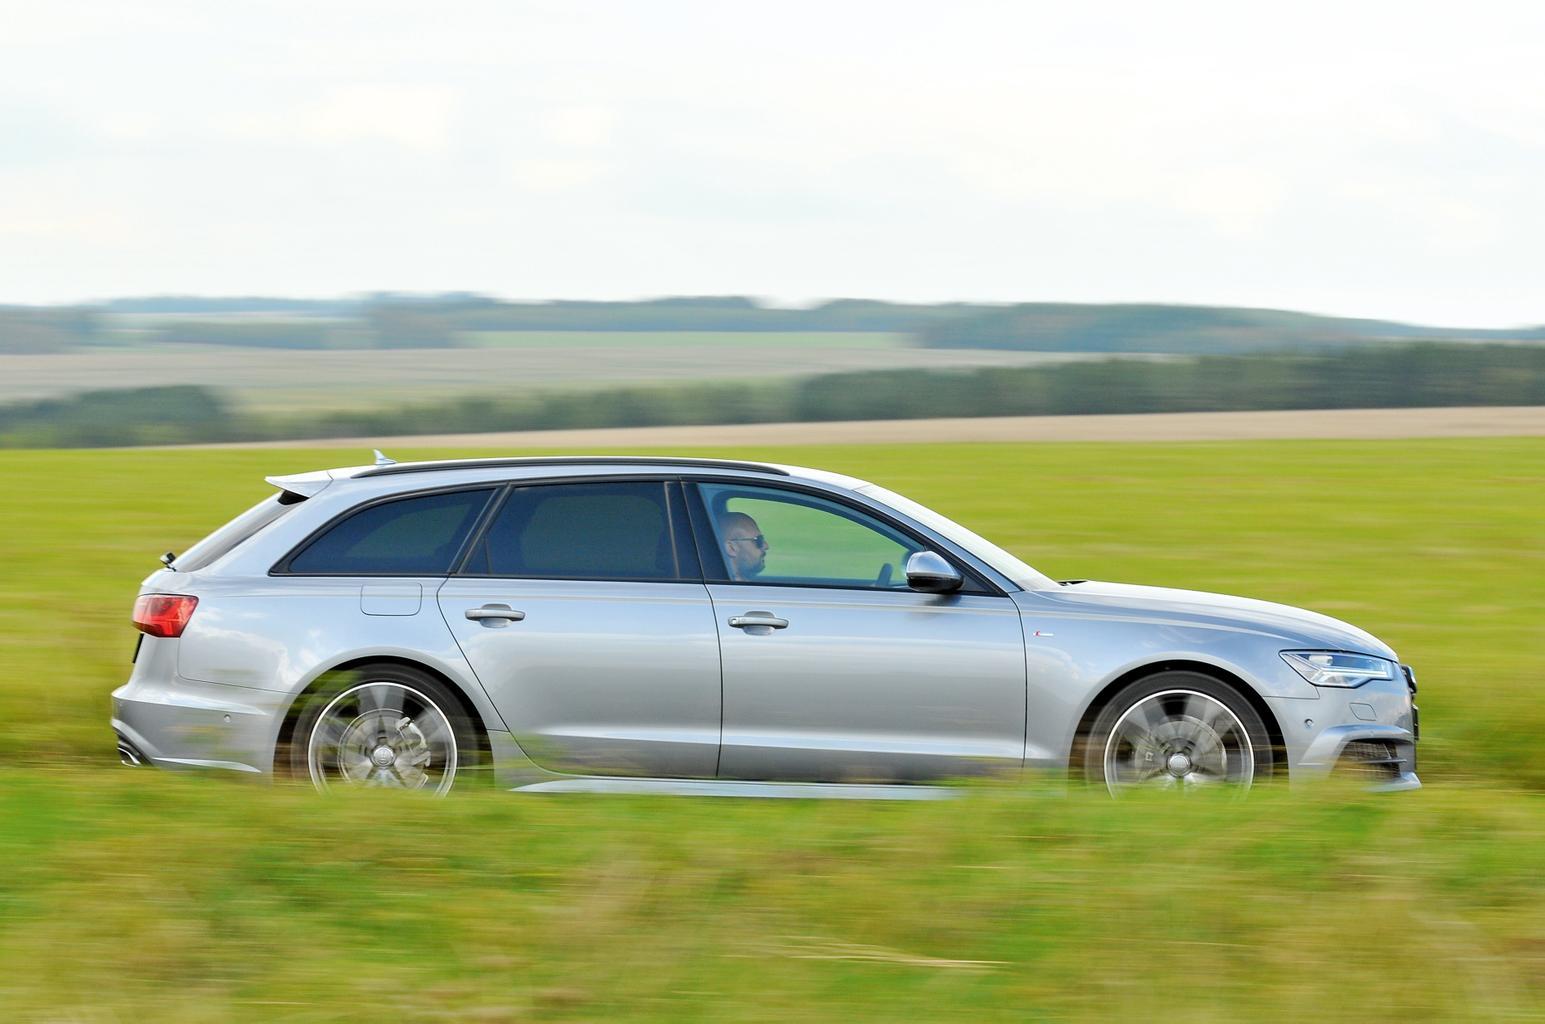 New Mercedes E-Class Estate and Volvo V90 vs Audi A6 Avant